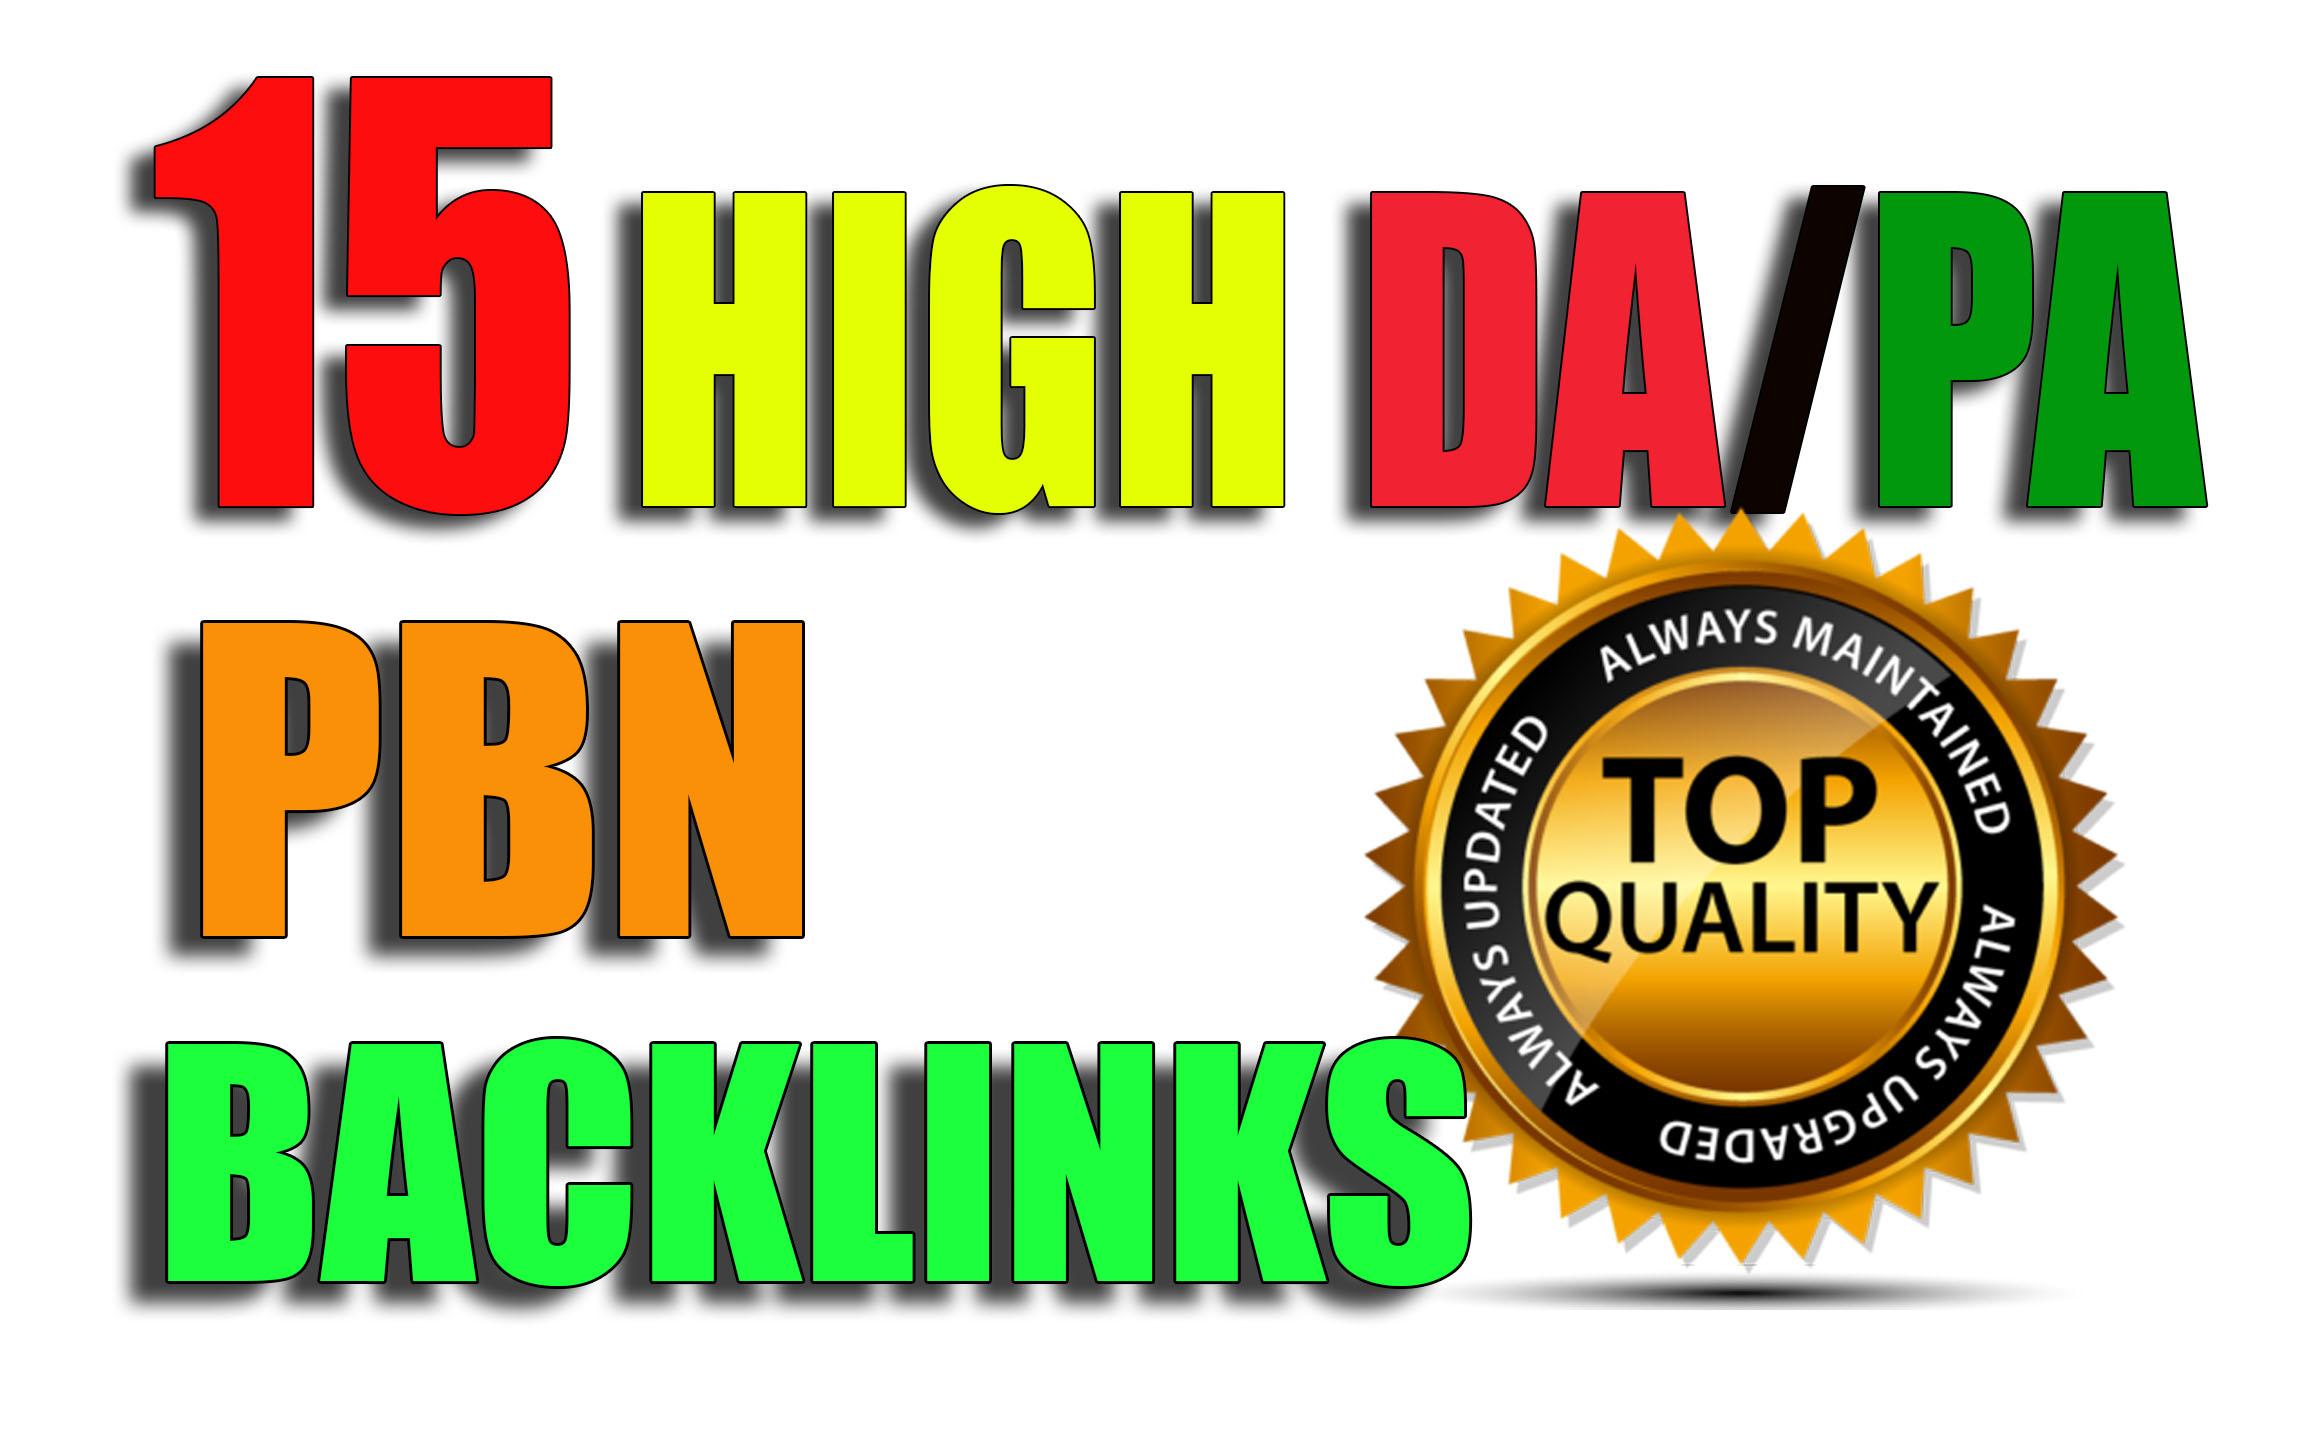 Build 15 High PA/DA/TF/CF Permanent Homepage PBN Backlinks With Skyrocket Quality Links